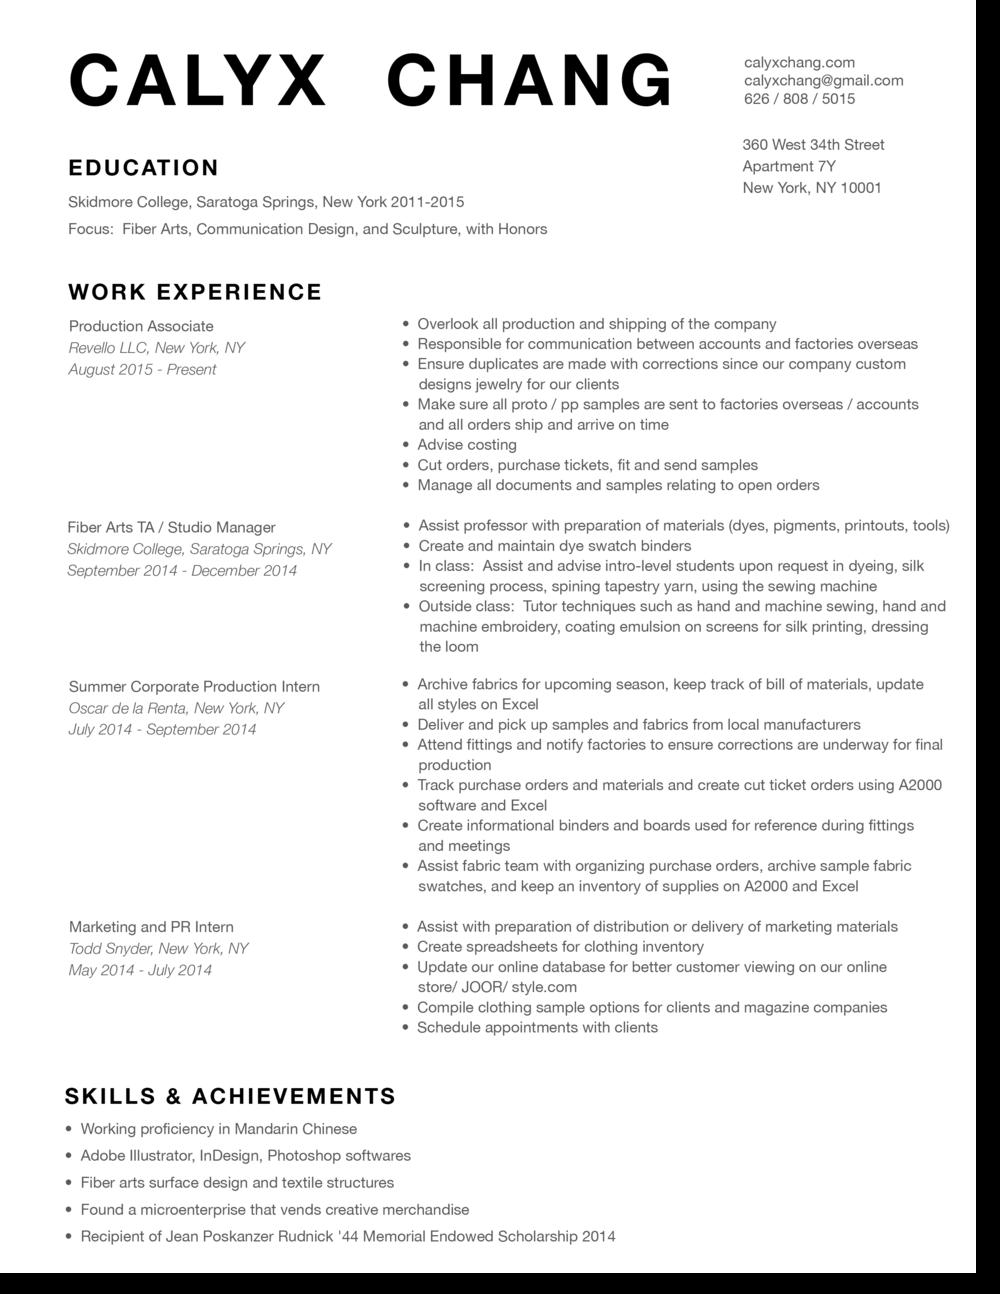 Resume Calyx Chang